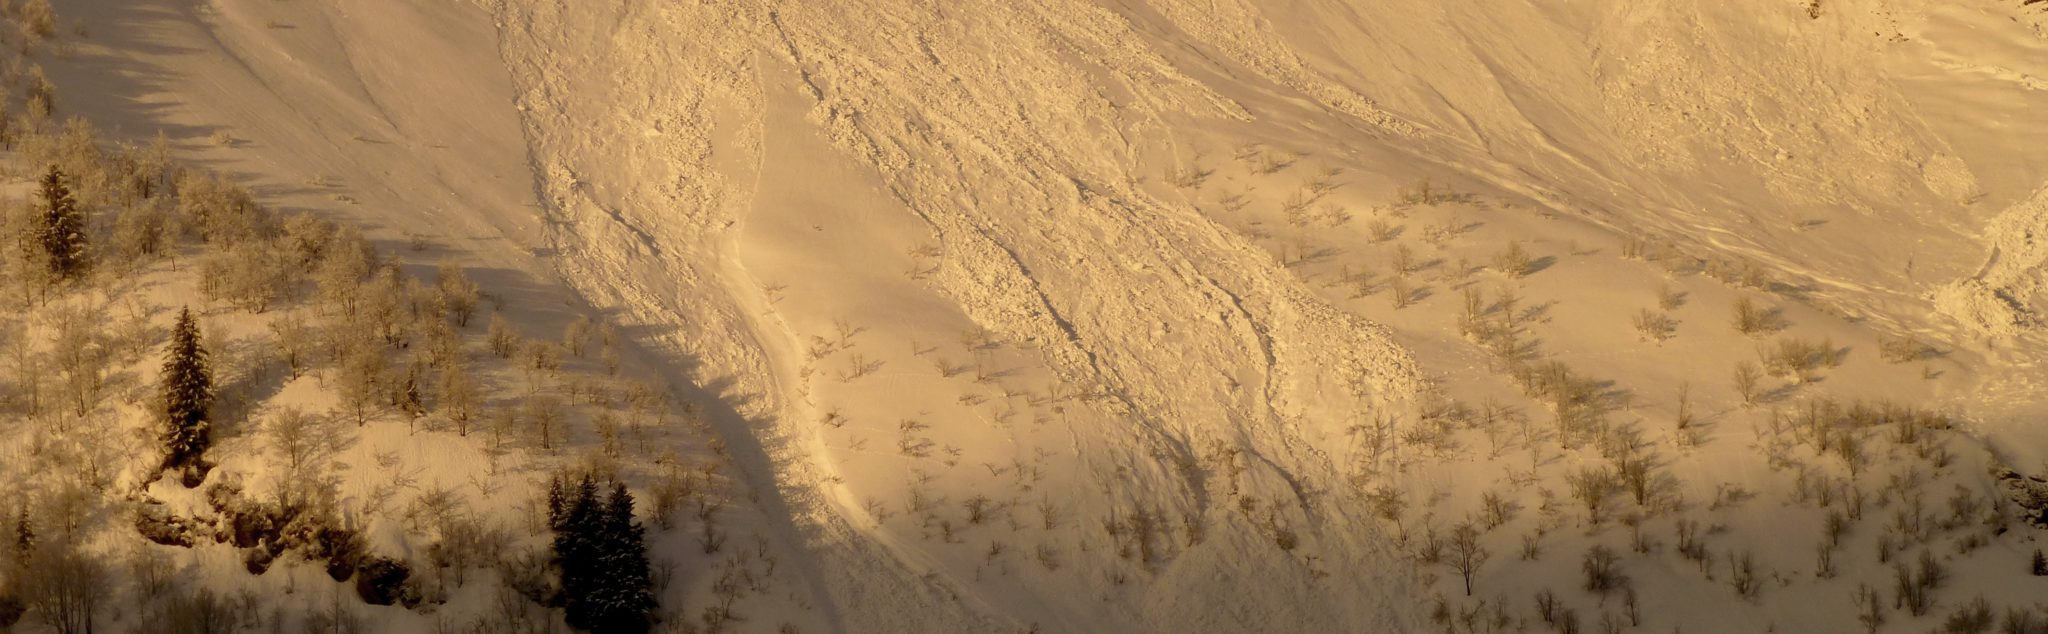 Photos des sommets alpins 5